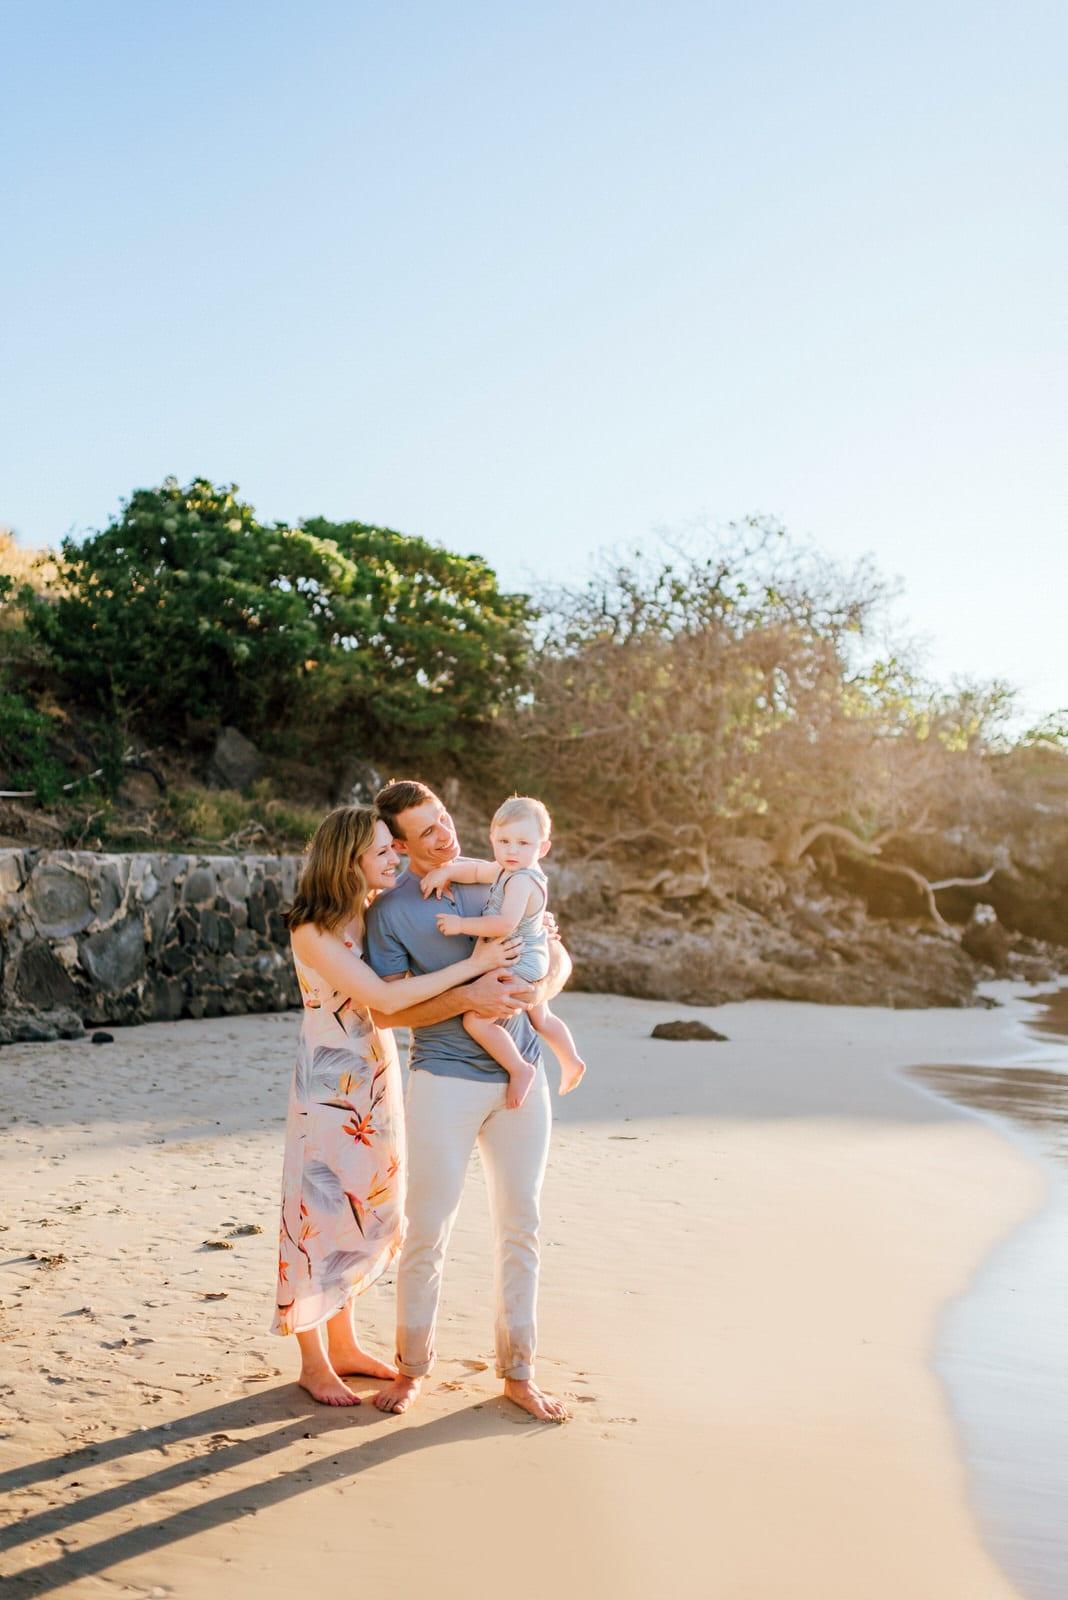 Family-Pictures-Hawaii-Mauna-Kea-Beach-26.jpg